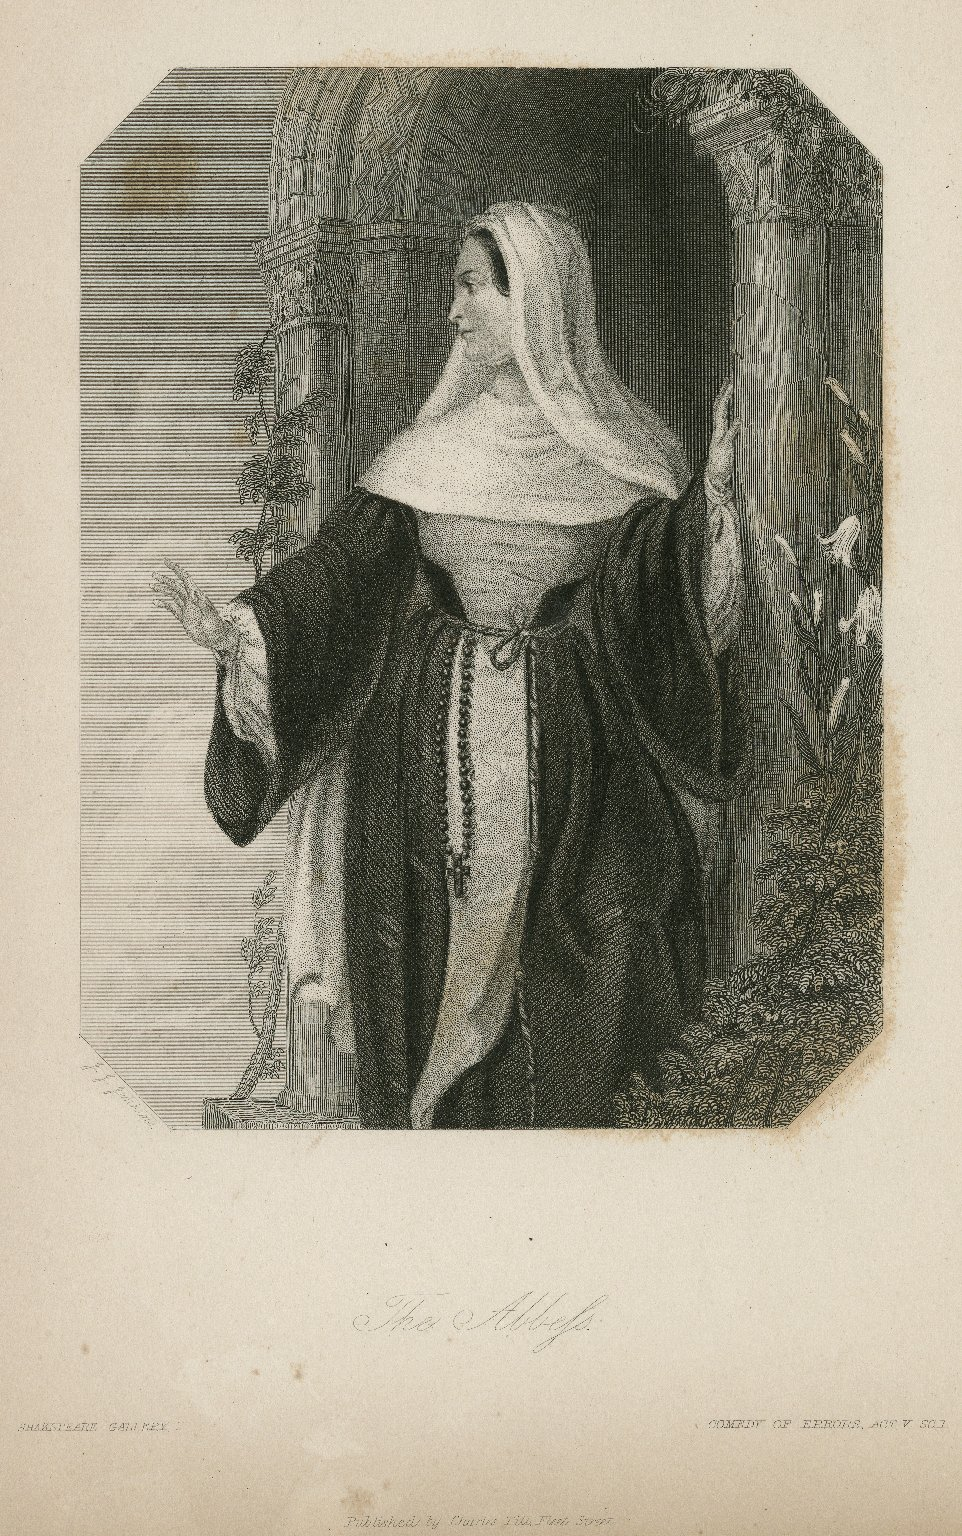 The Abbess, Comedy of errors, act V, sc. 1 [graphic] / J.J. Jenkins ; Jackman.